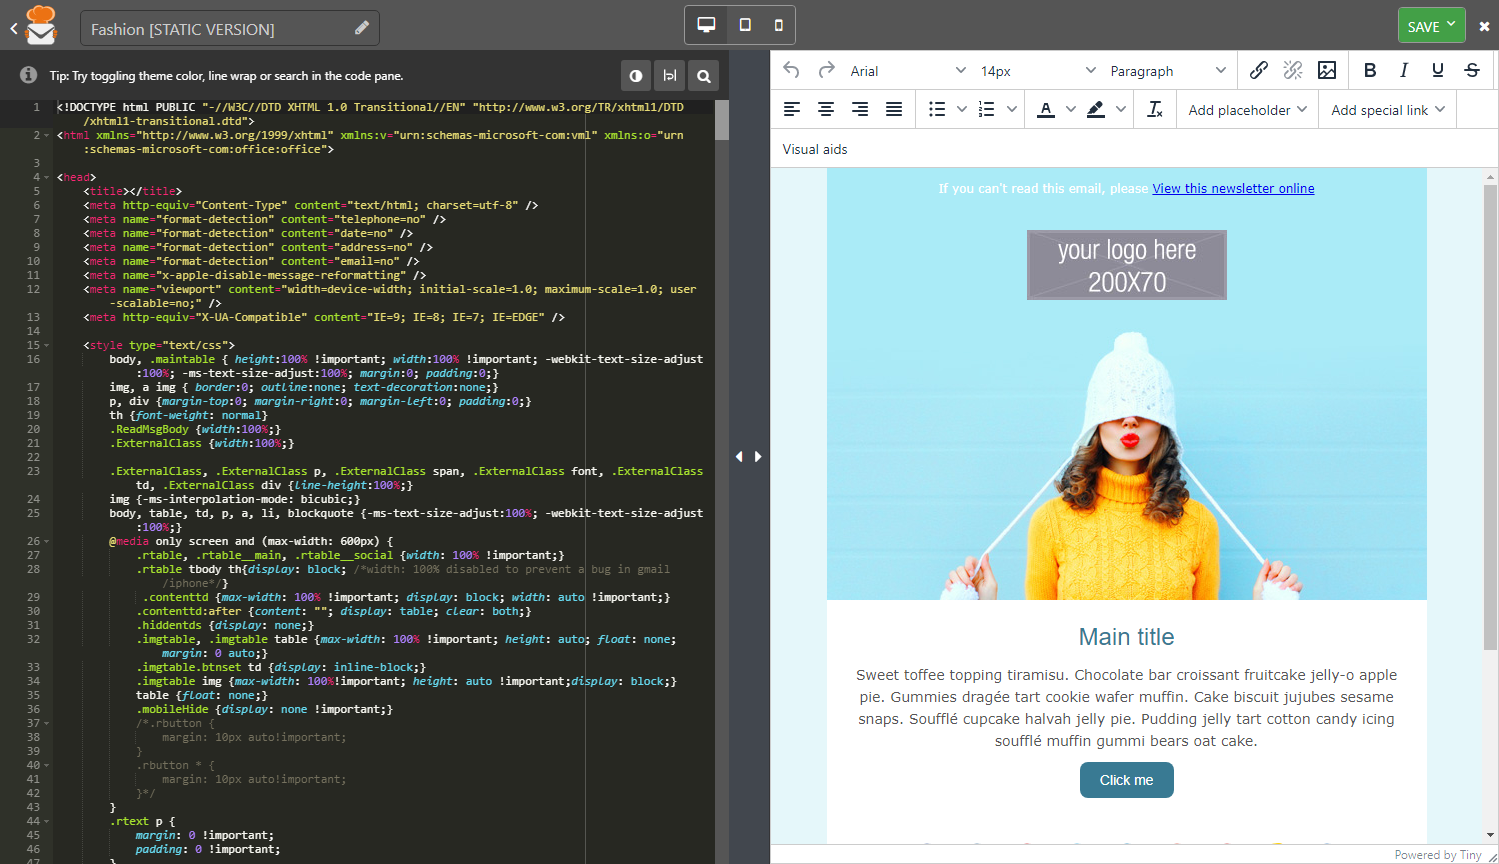 eMailChef newsletter text editor